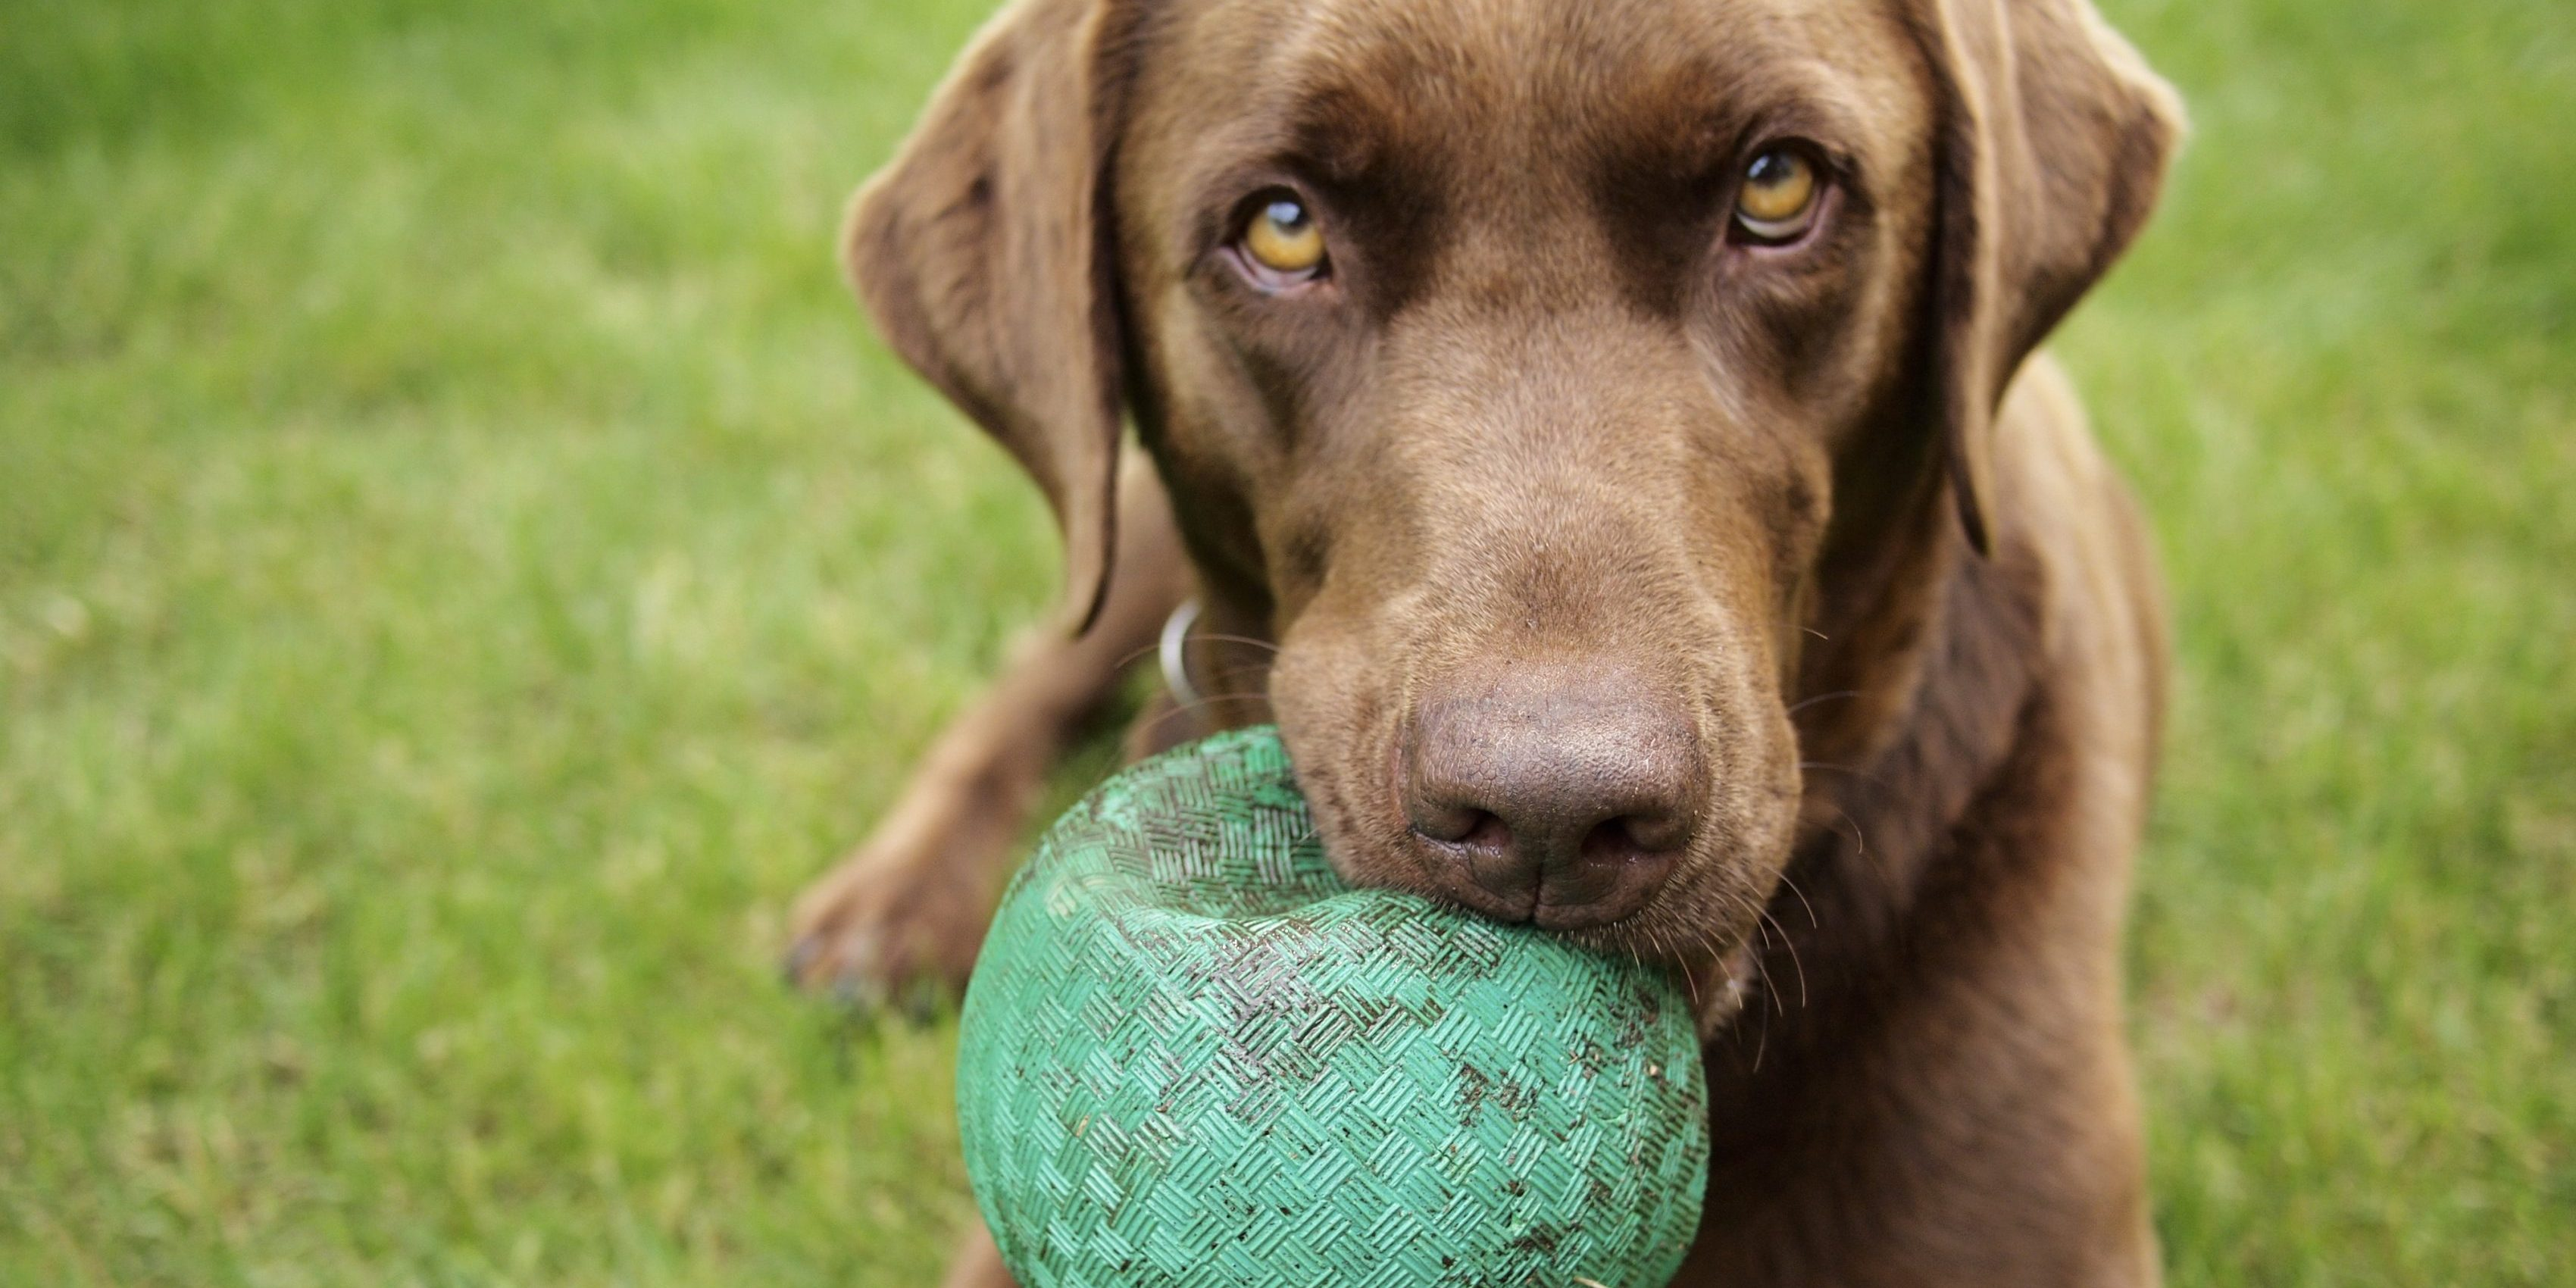 Caninsulin.com A Chocolate Labrador holds a Green Ball